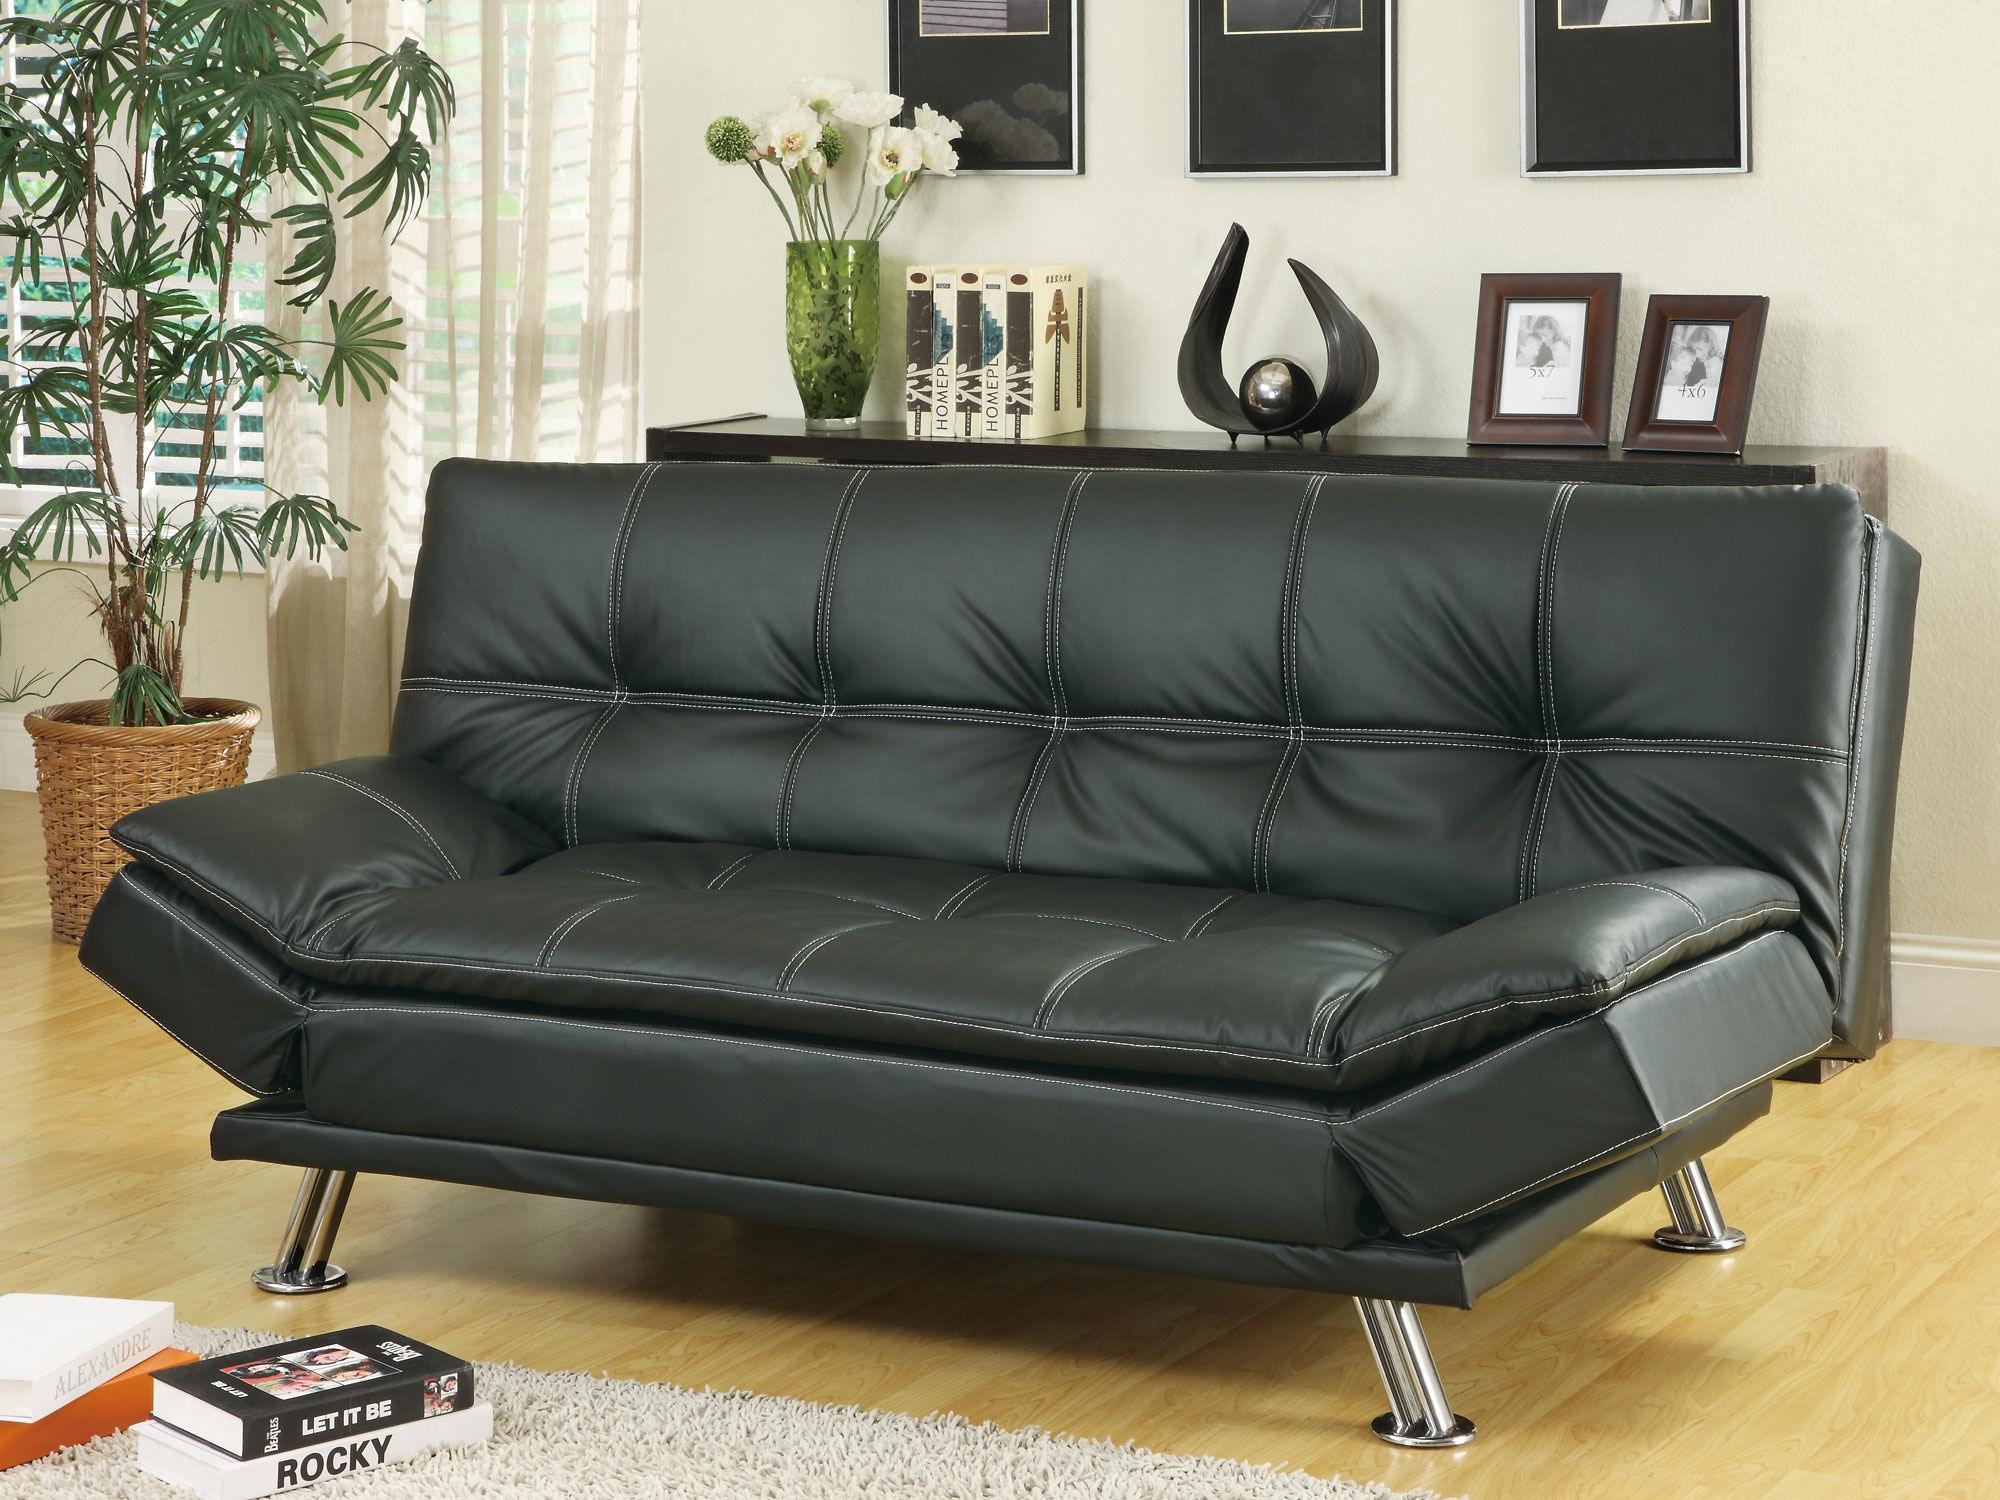 Coaster Living Room Sofa Bed Royal Furniture and Design